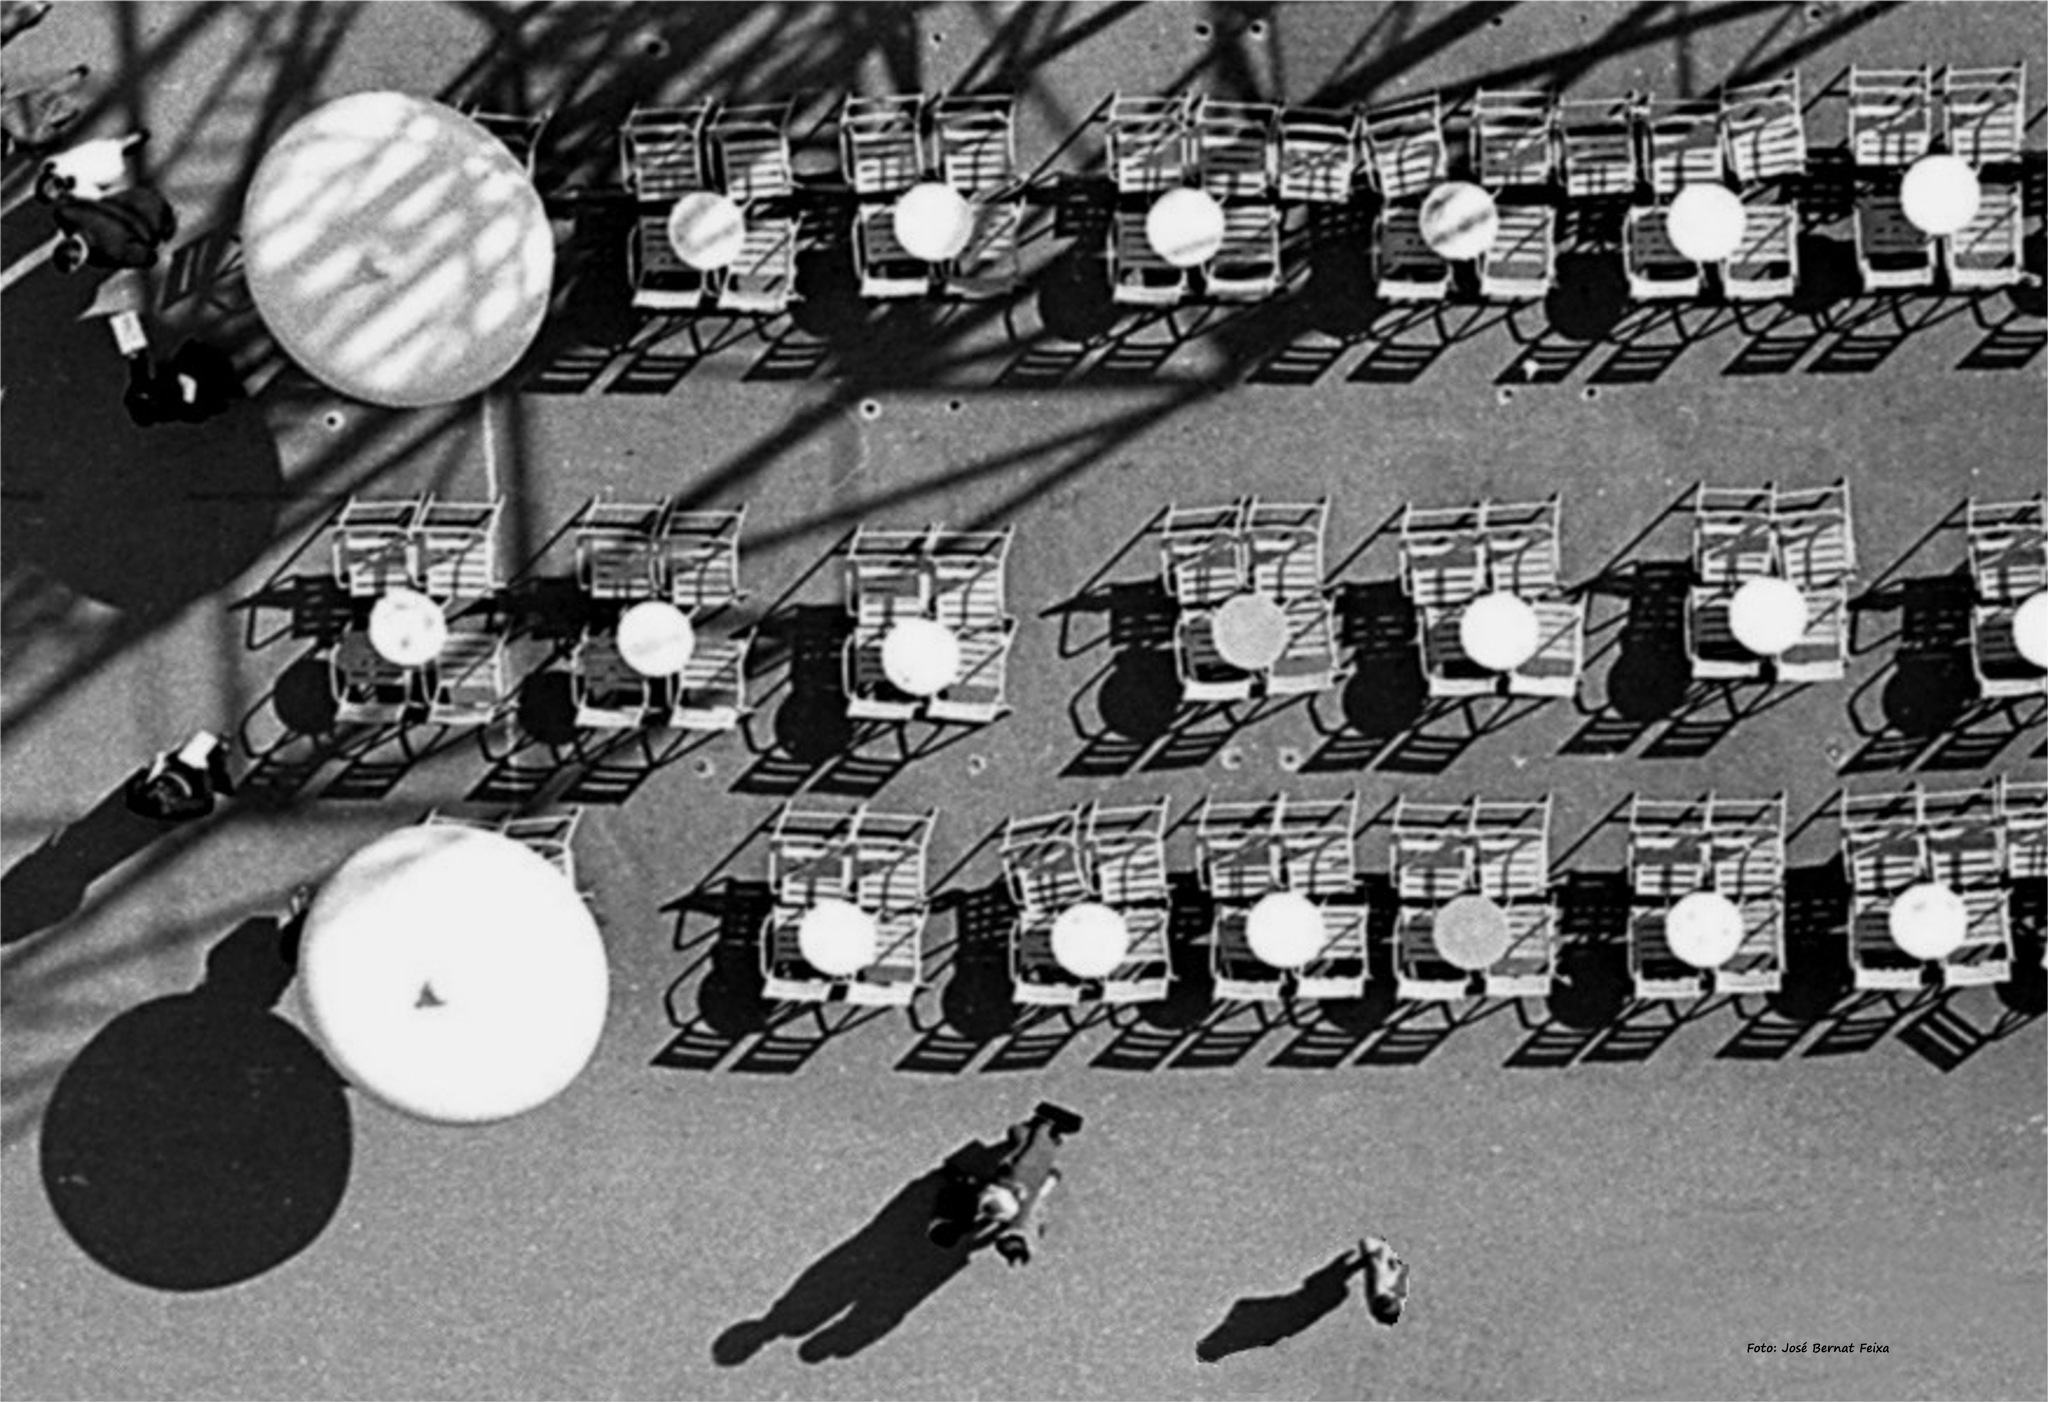 SOMBRAS; SCHADUWEN; SHADOWS (60's) by José Bernat Feixa